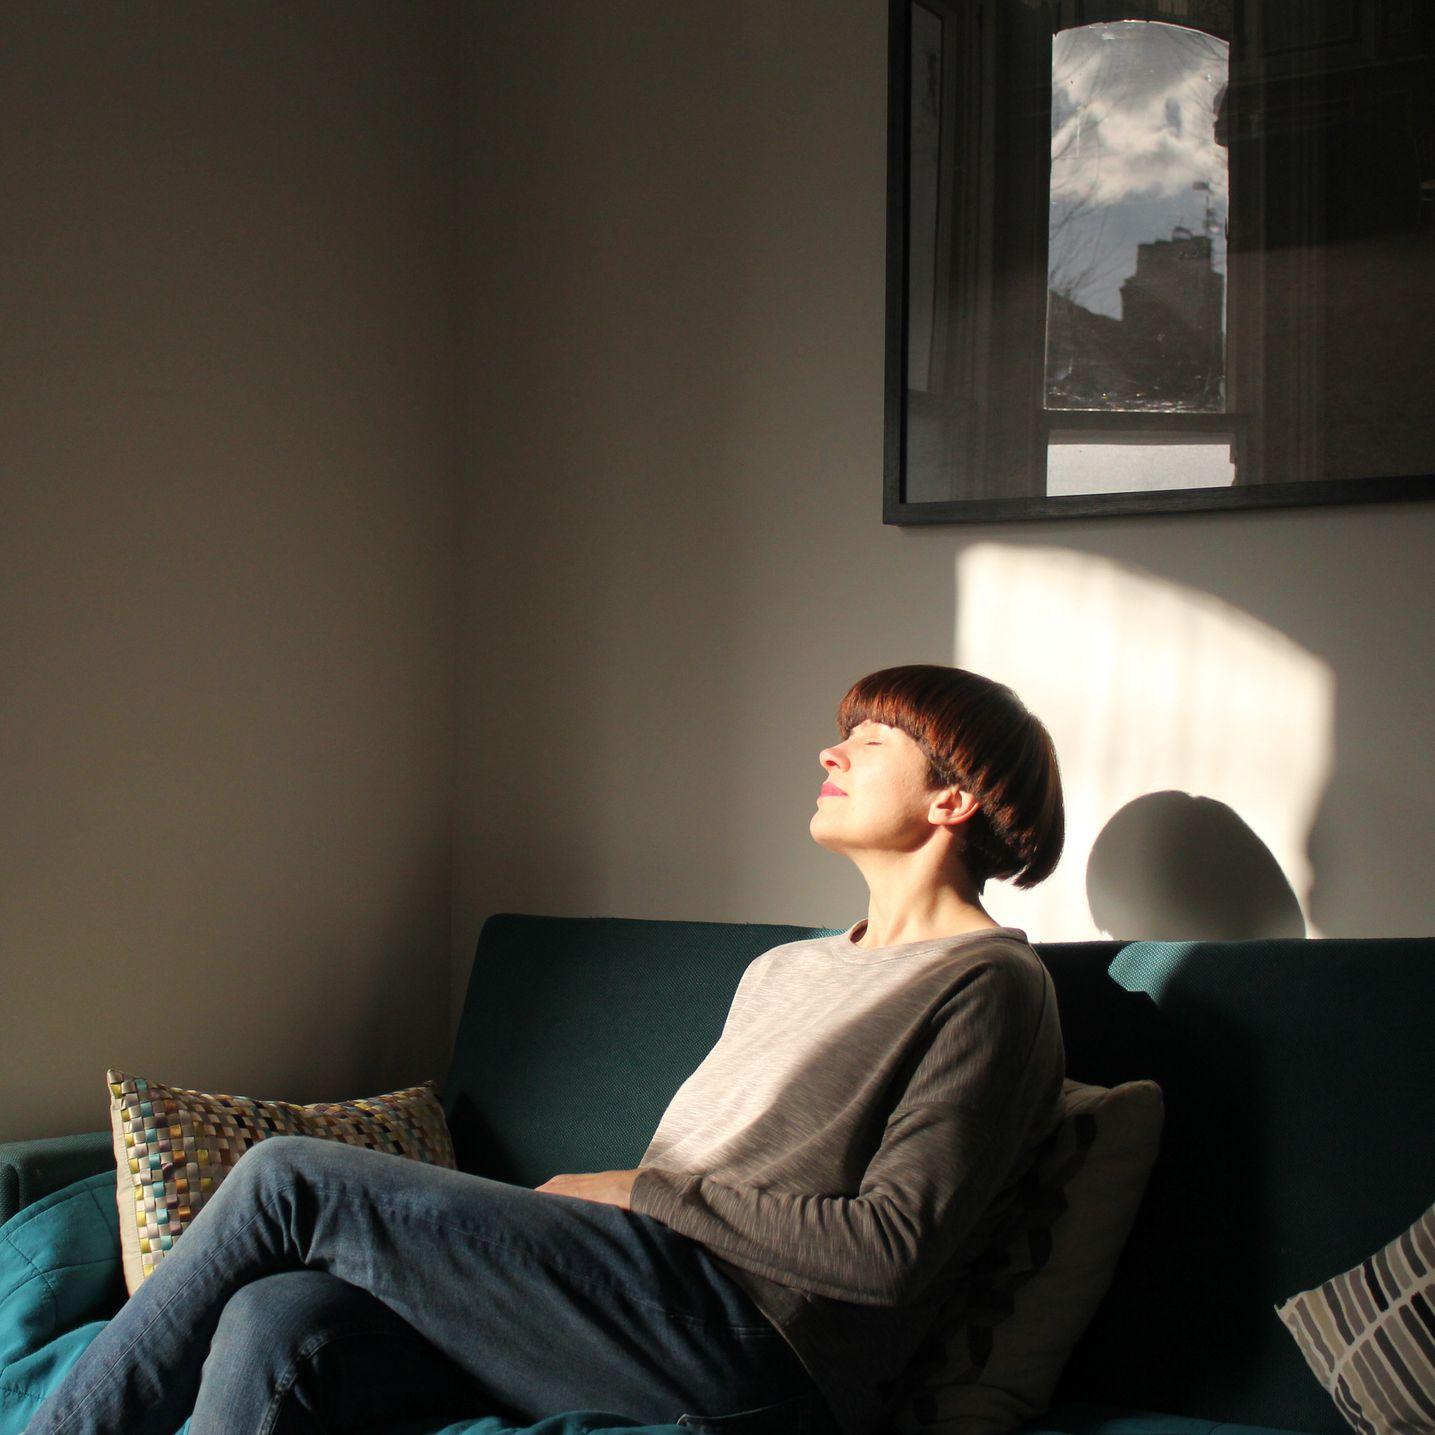 Detrimental Habits With Fibromyalgia and ME/CFS